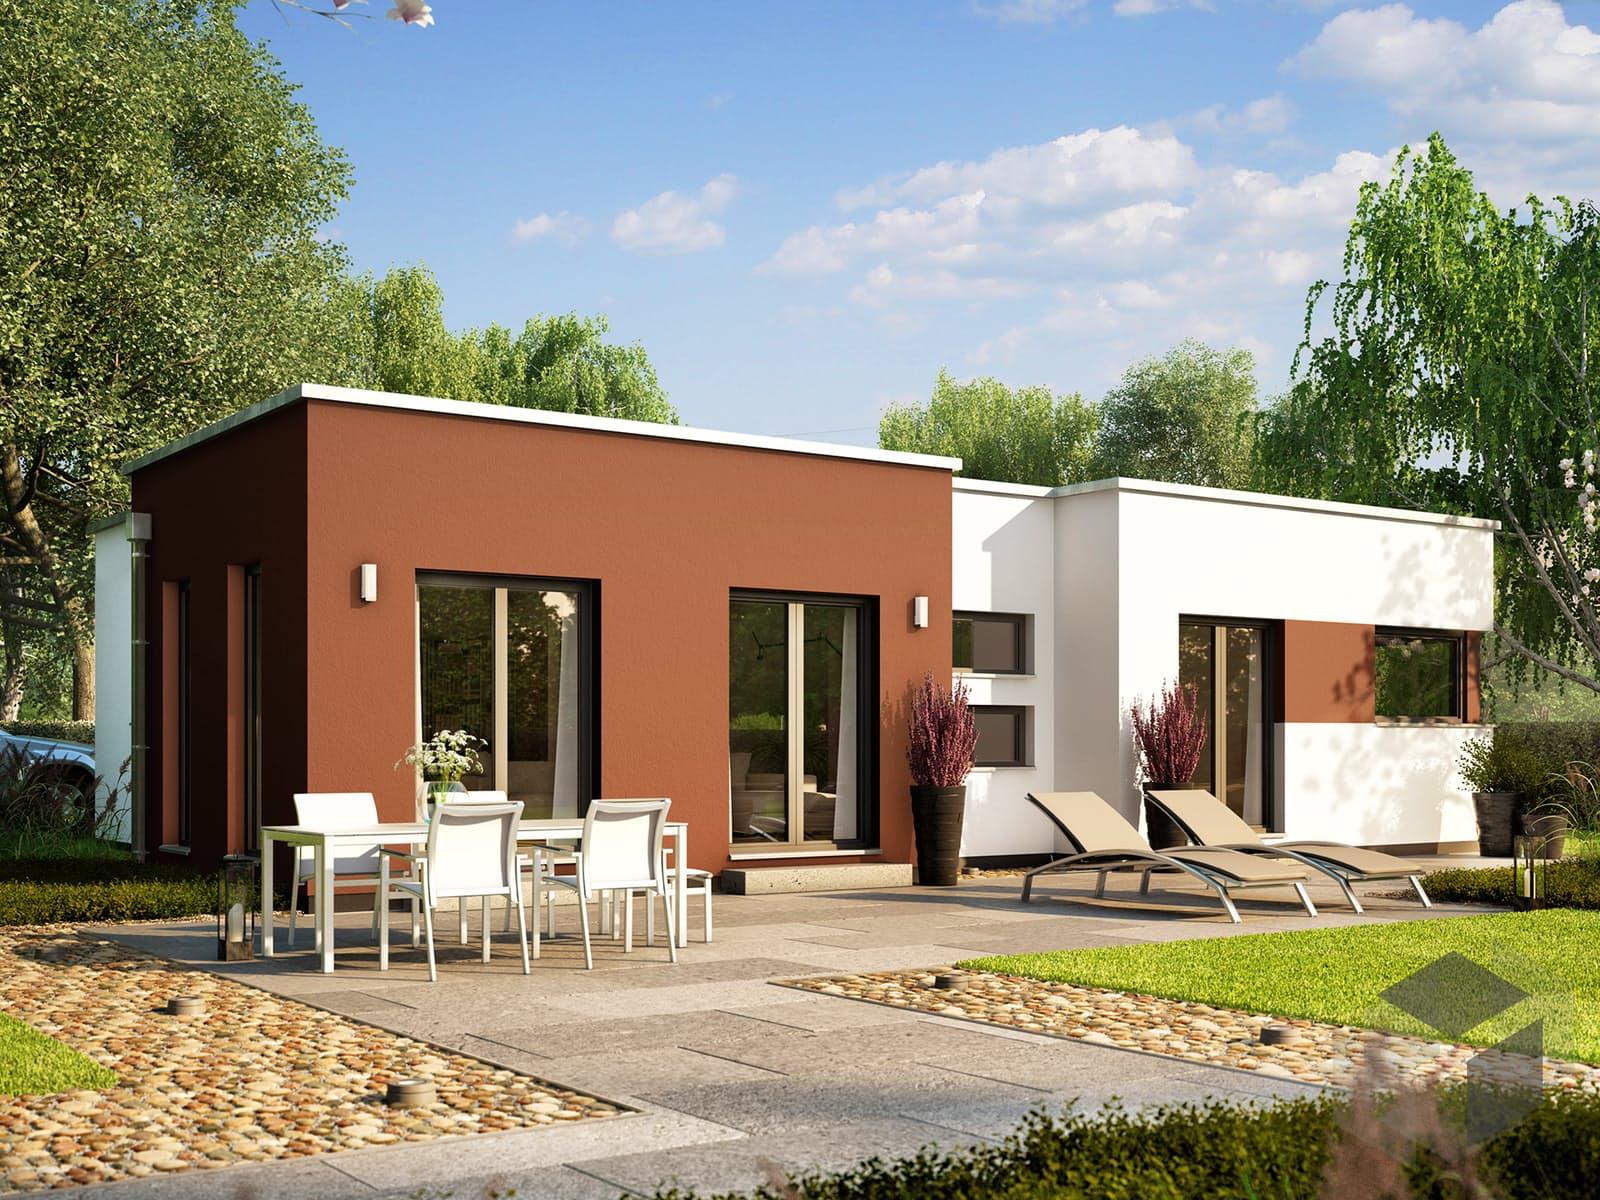 solution 87 v6 von living haus komplette daten bersicht. Black Bedroom Furniture Sets. Home Design Ideas